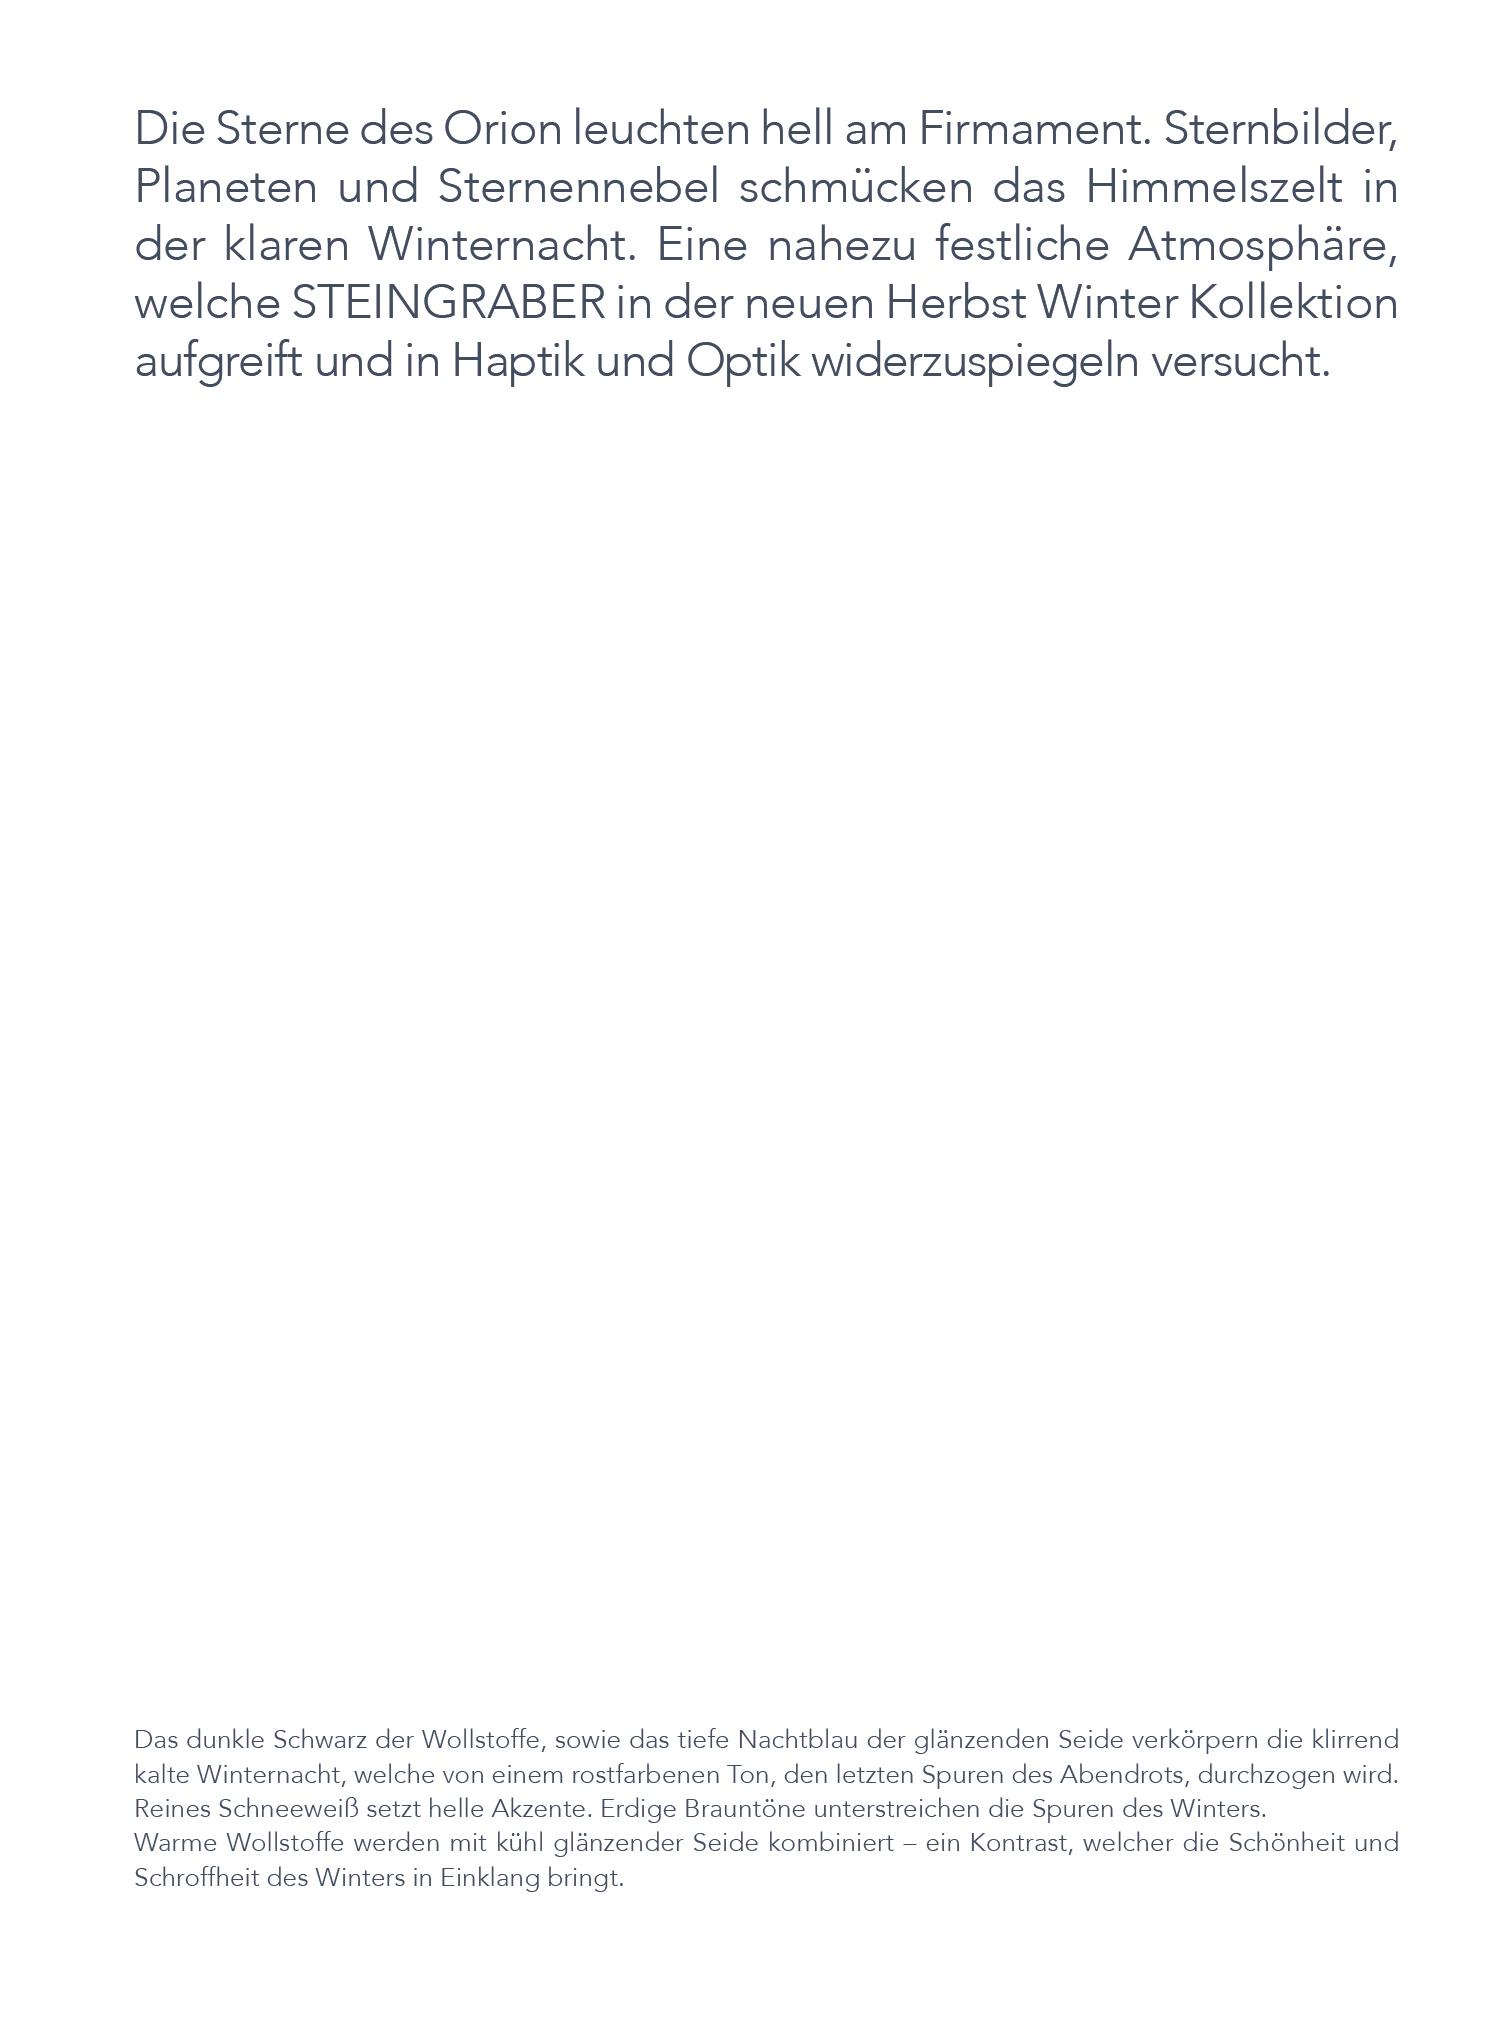 steingraber_lookbook_fw1920_print_inhaltneu5.jpg